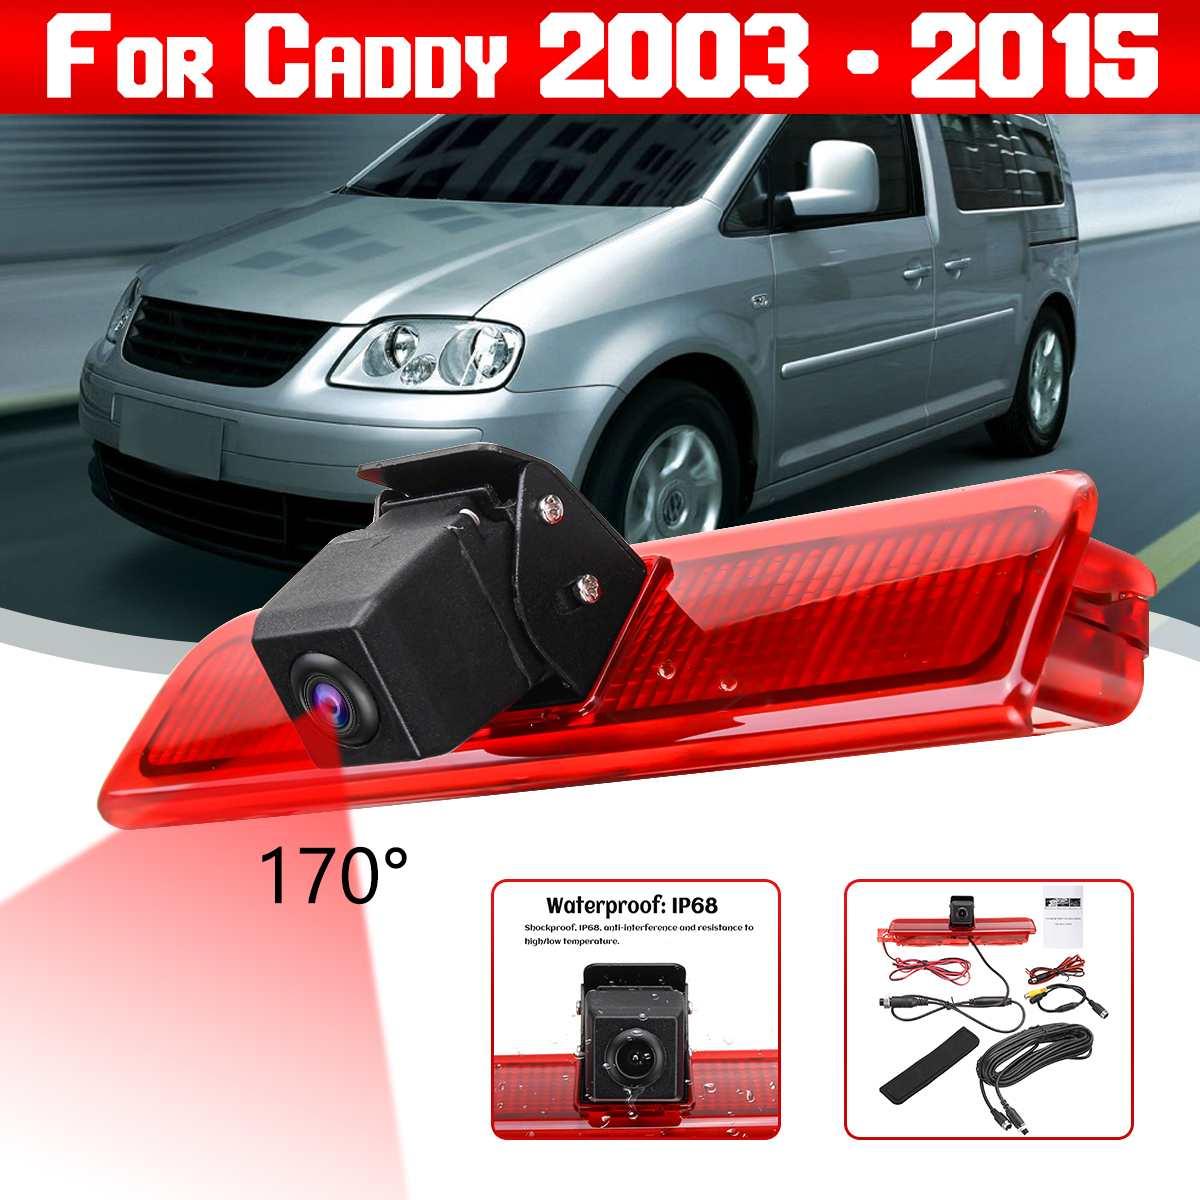 Car Rear View Camera Reverse Parking Backup 3rd Brake Light Night Vision Waterproof Monitor For VW Caddy 2003 - 2015